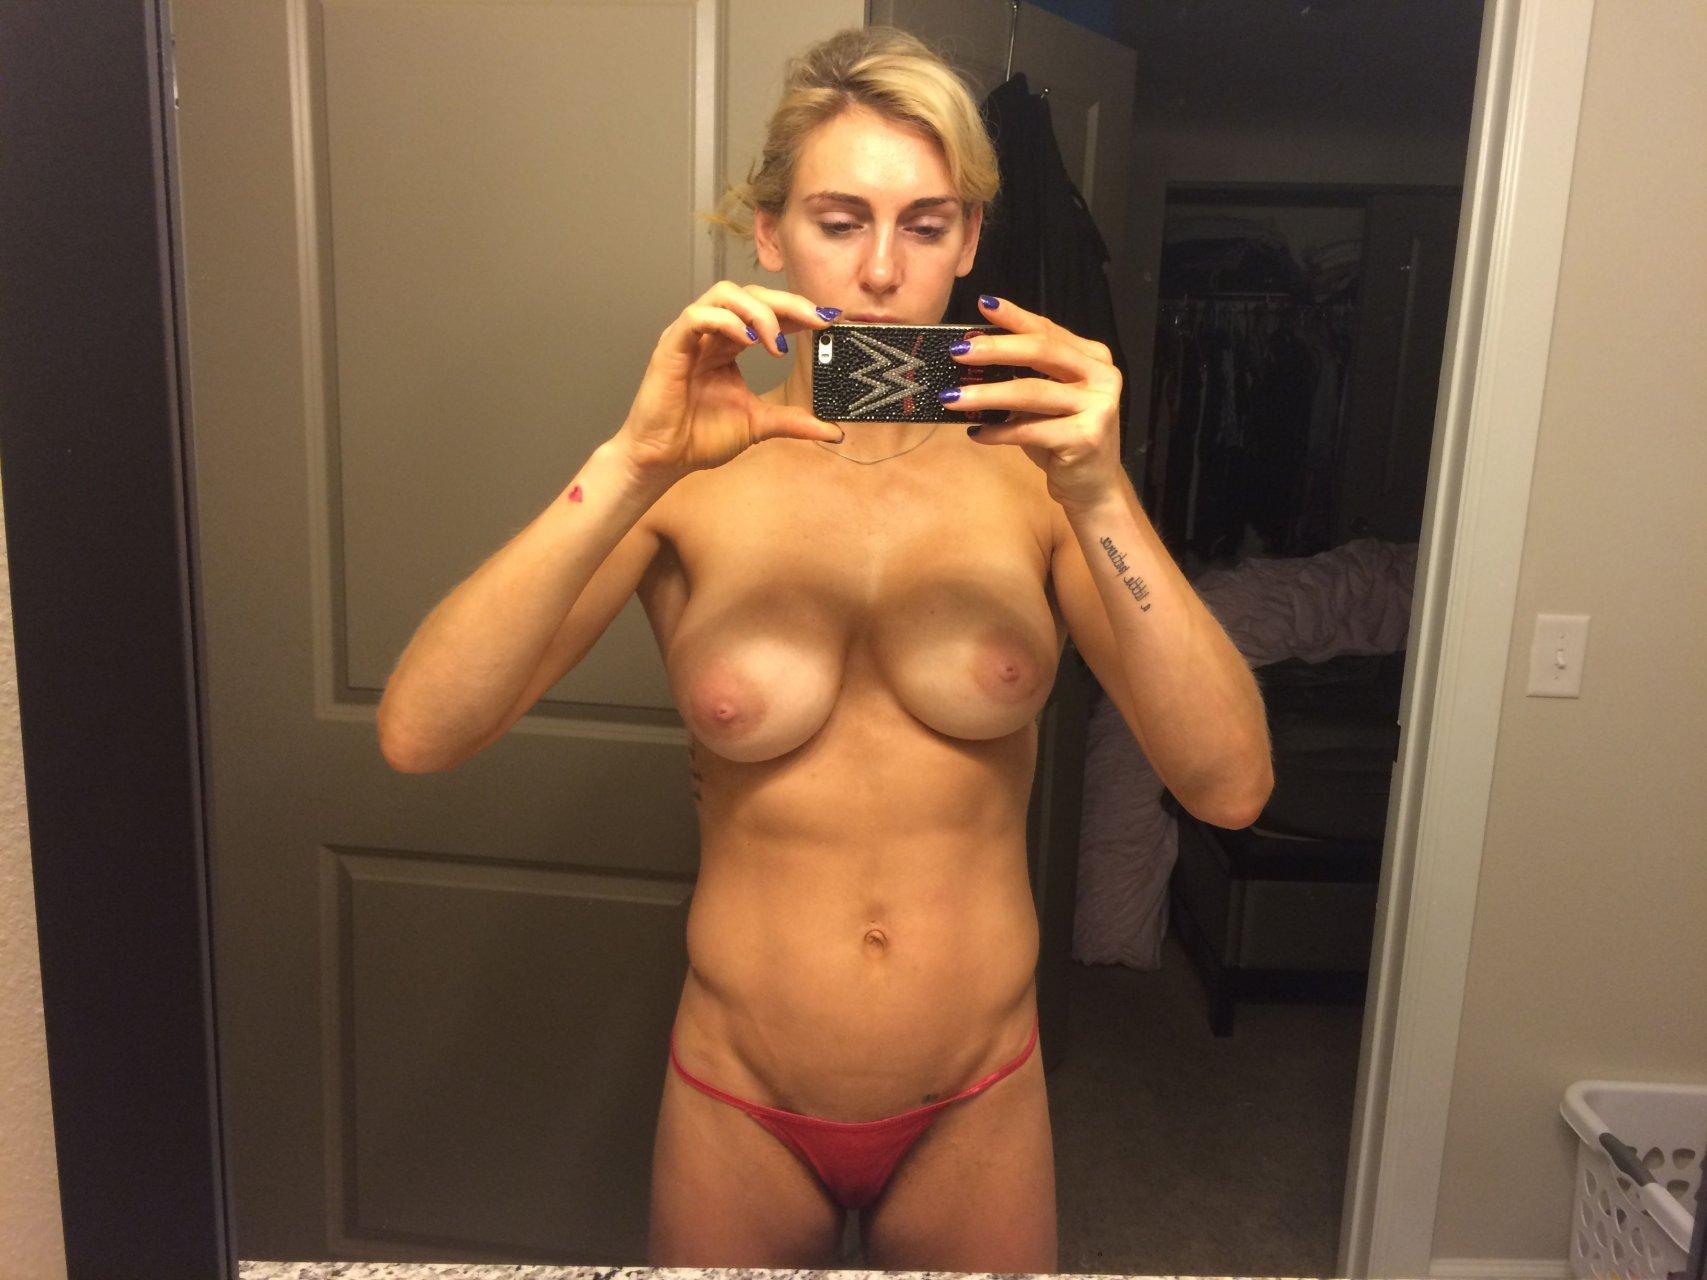 Erotic nude massage vidoes